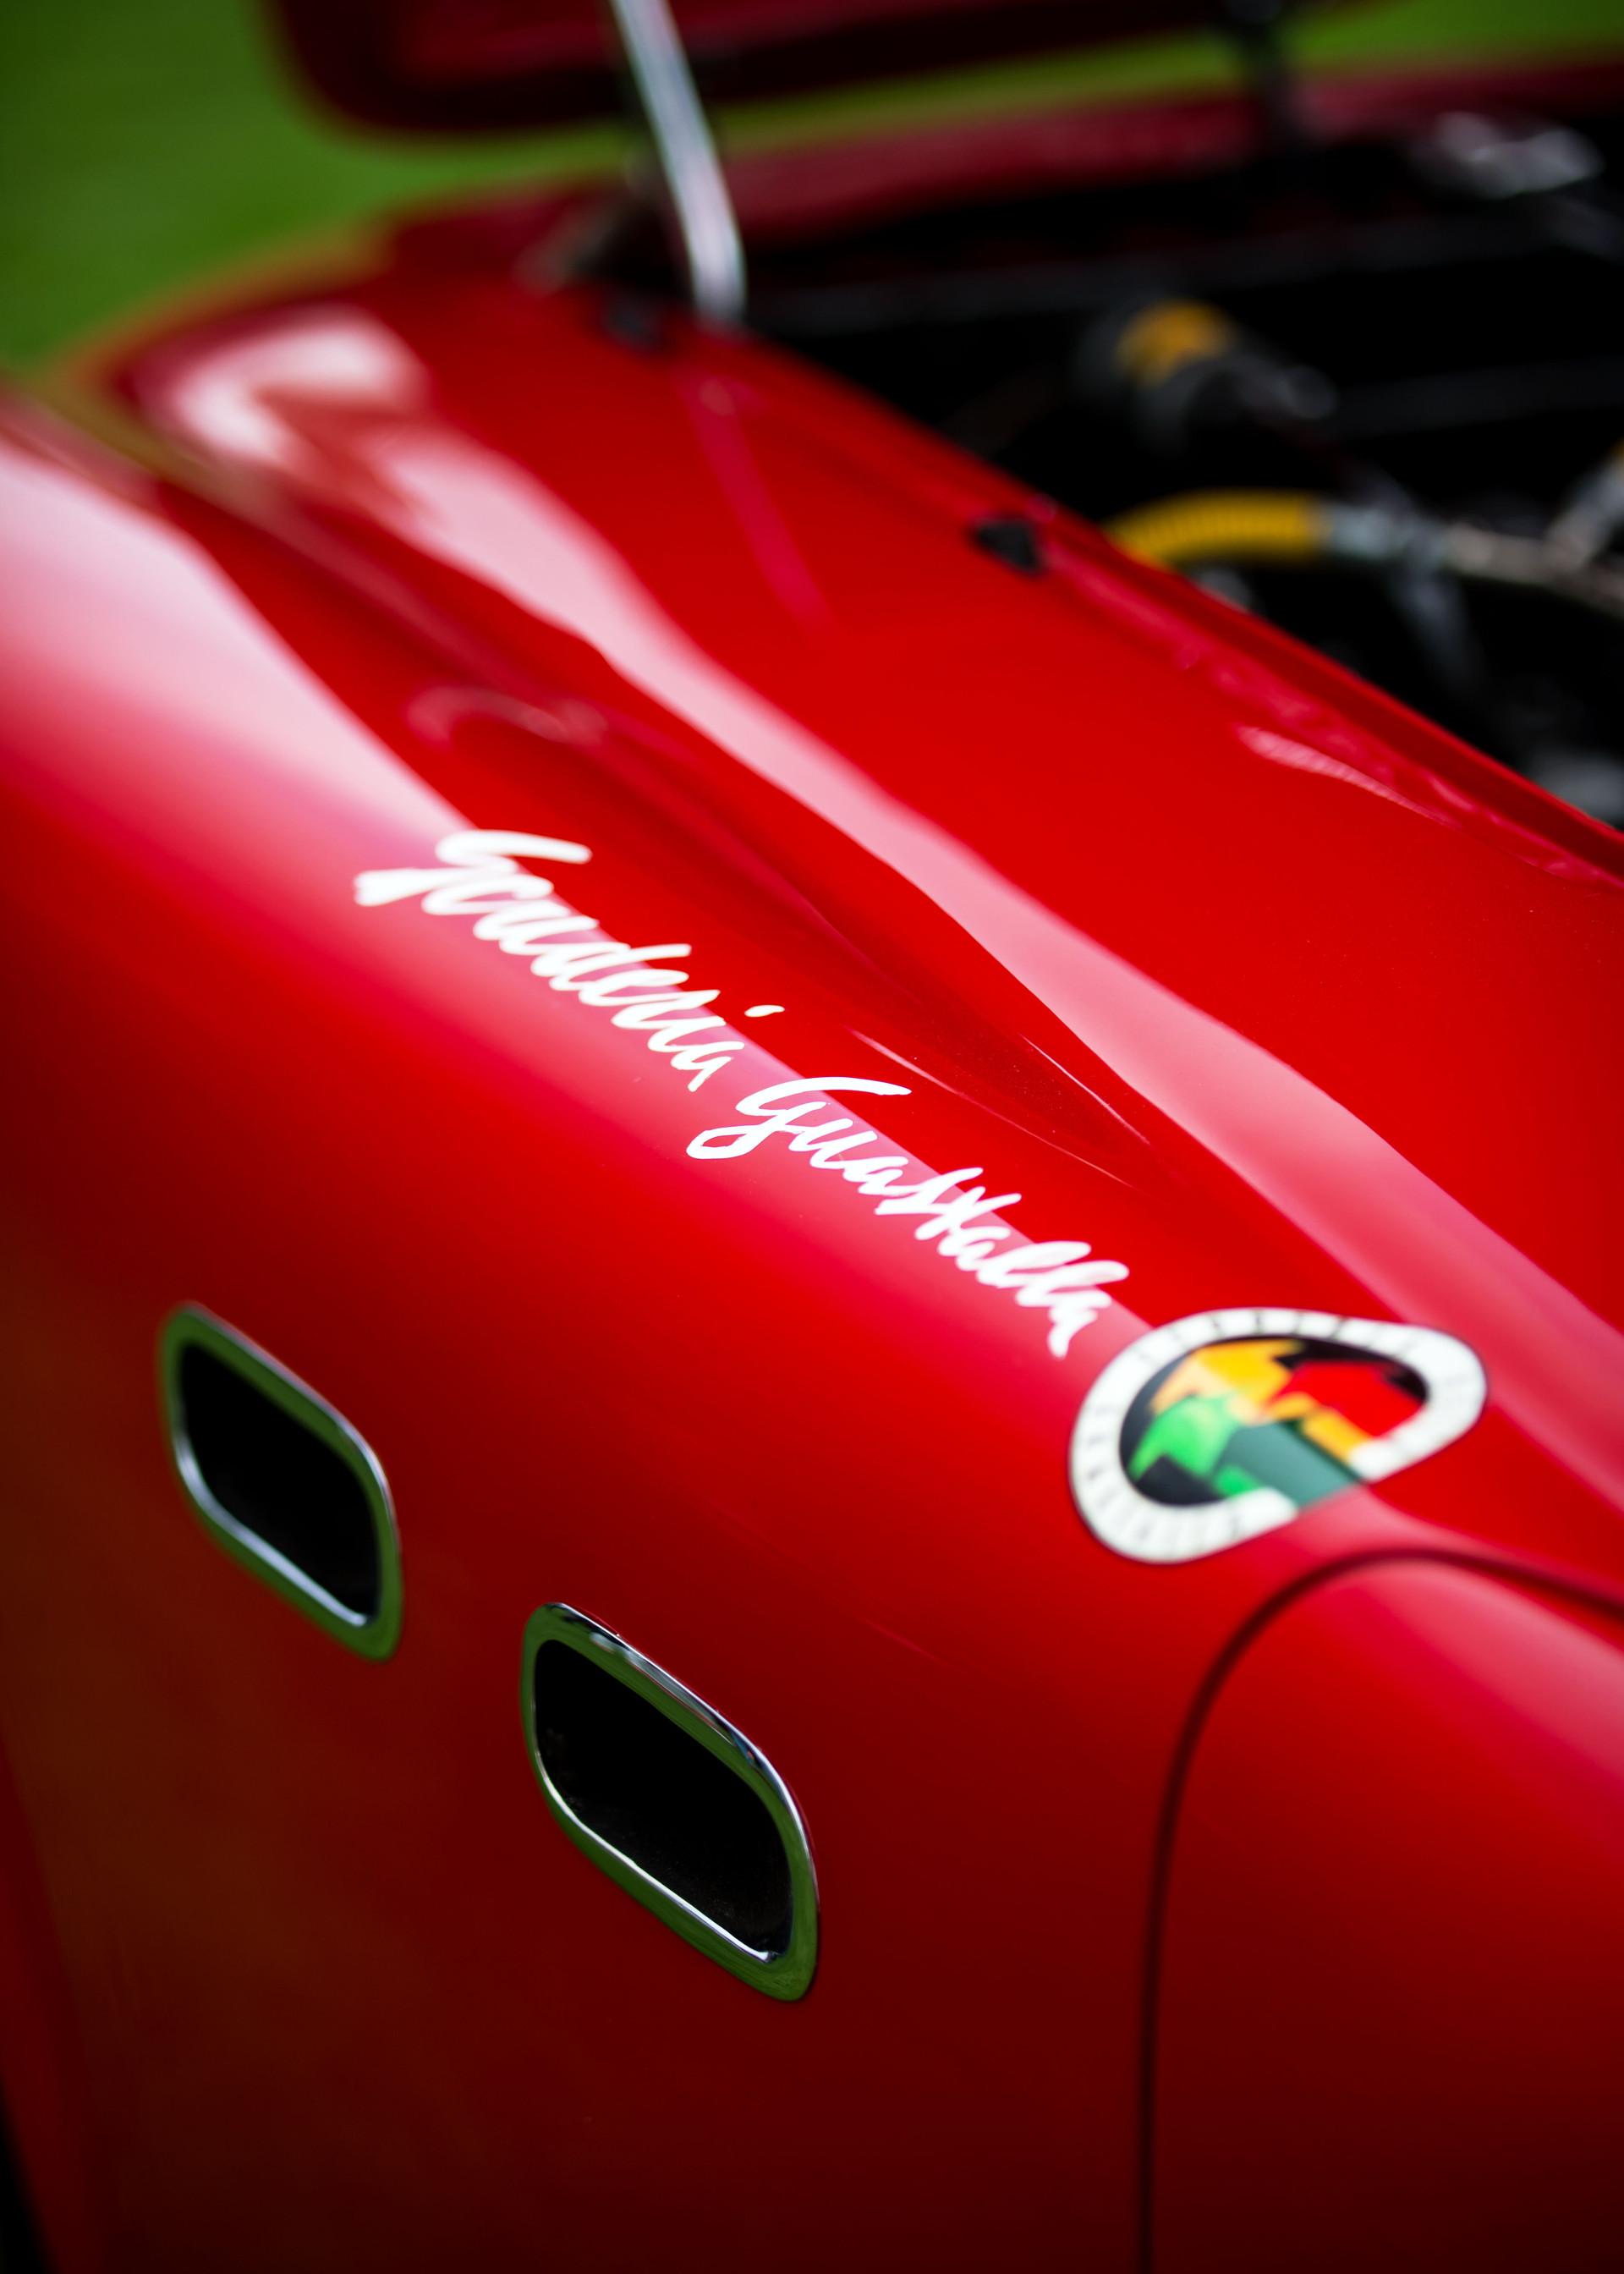 1952 Ferrari 212 225 Vignale Inter Berli